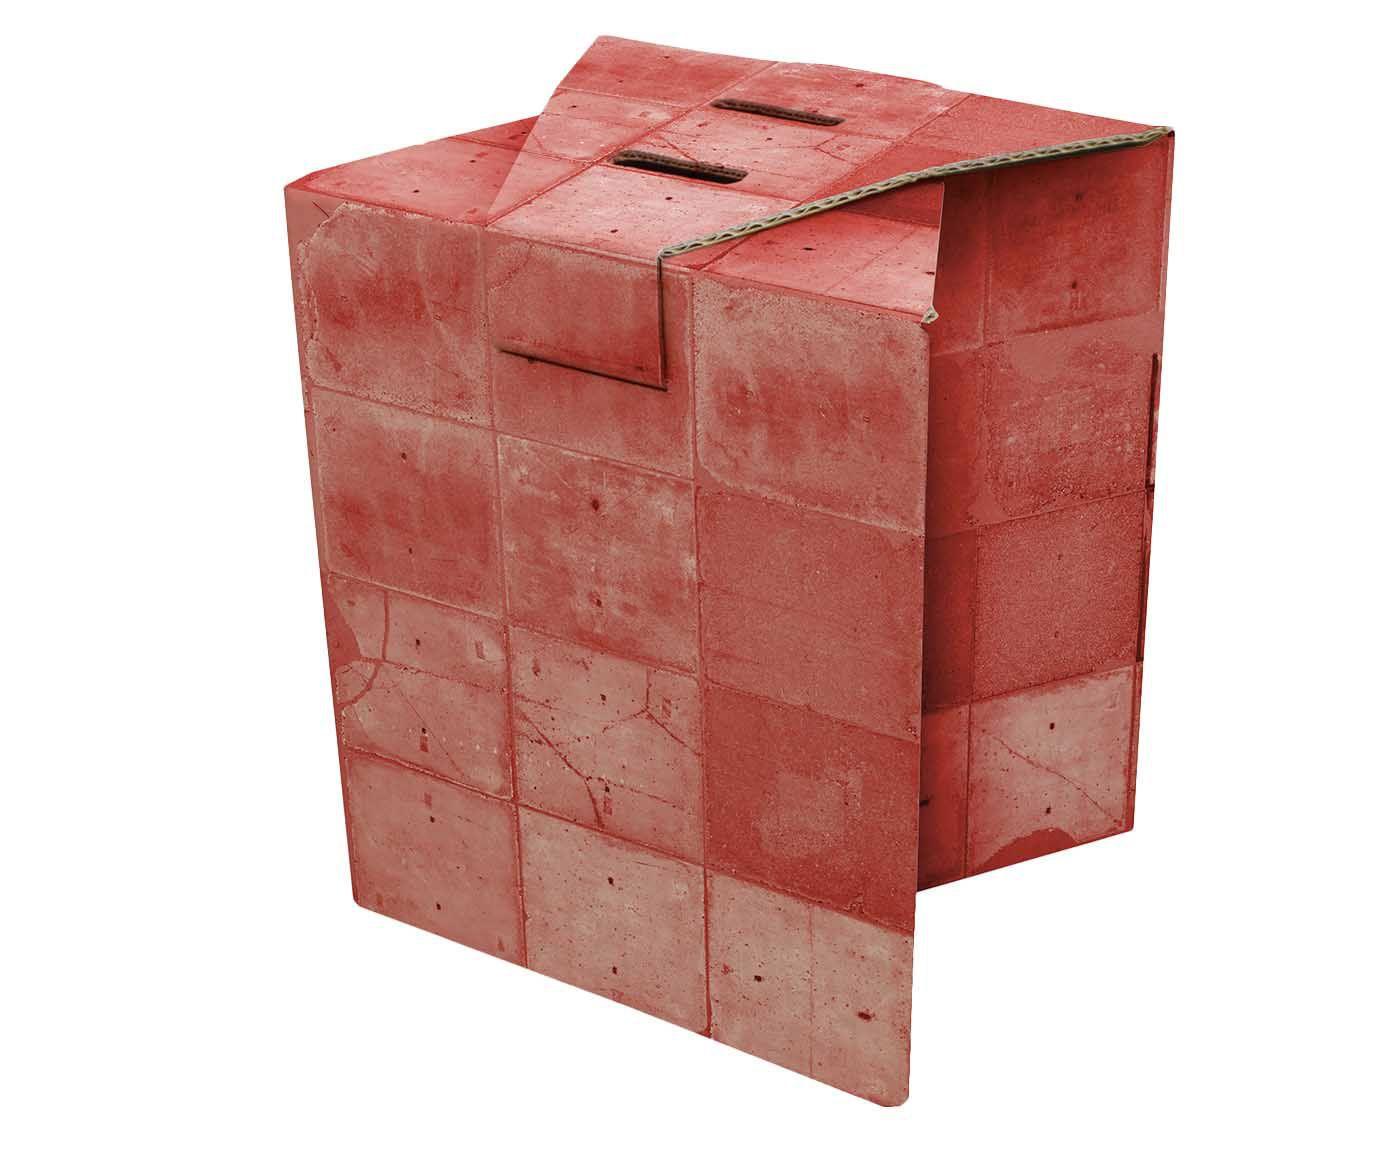 Banco rube tiles - rama | Westwing.com.br